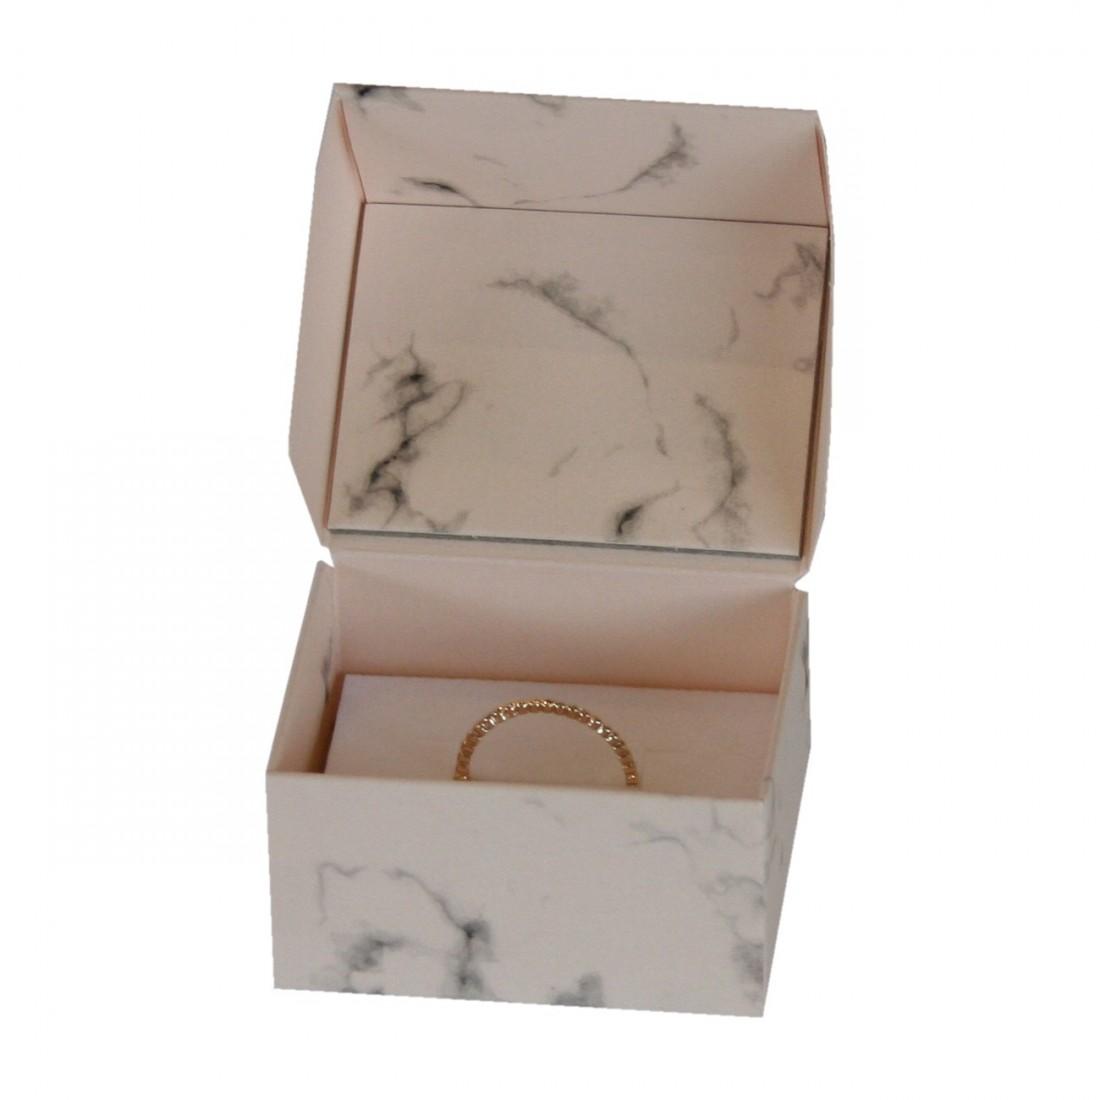 Estuche de joyería de cartón con estampado mármol rosa, para anillo o pendientes.